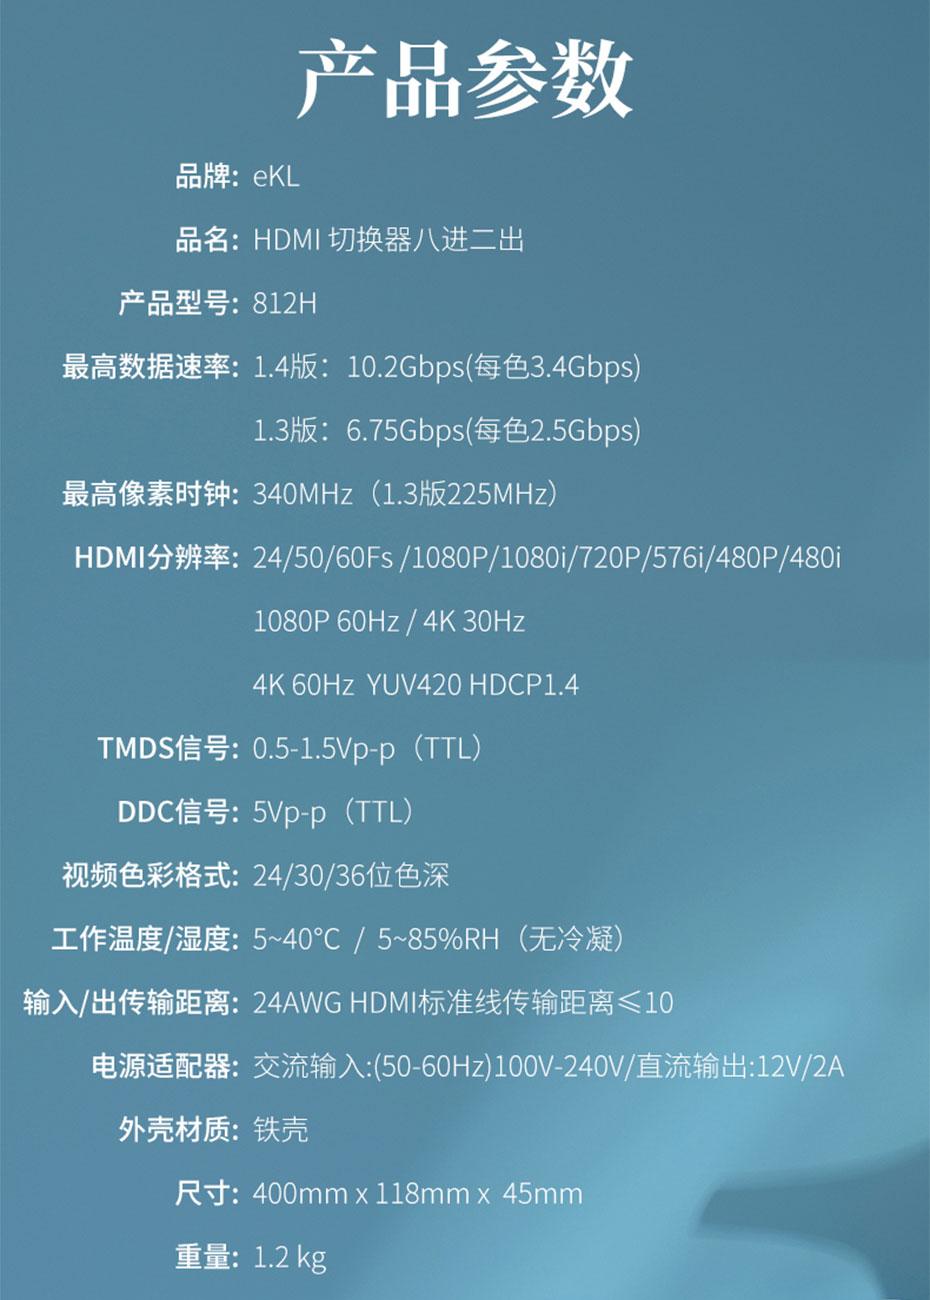 HDMI切换器八进一出/八进二出812H规格参数